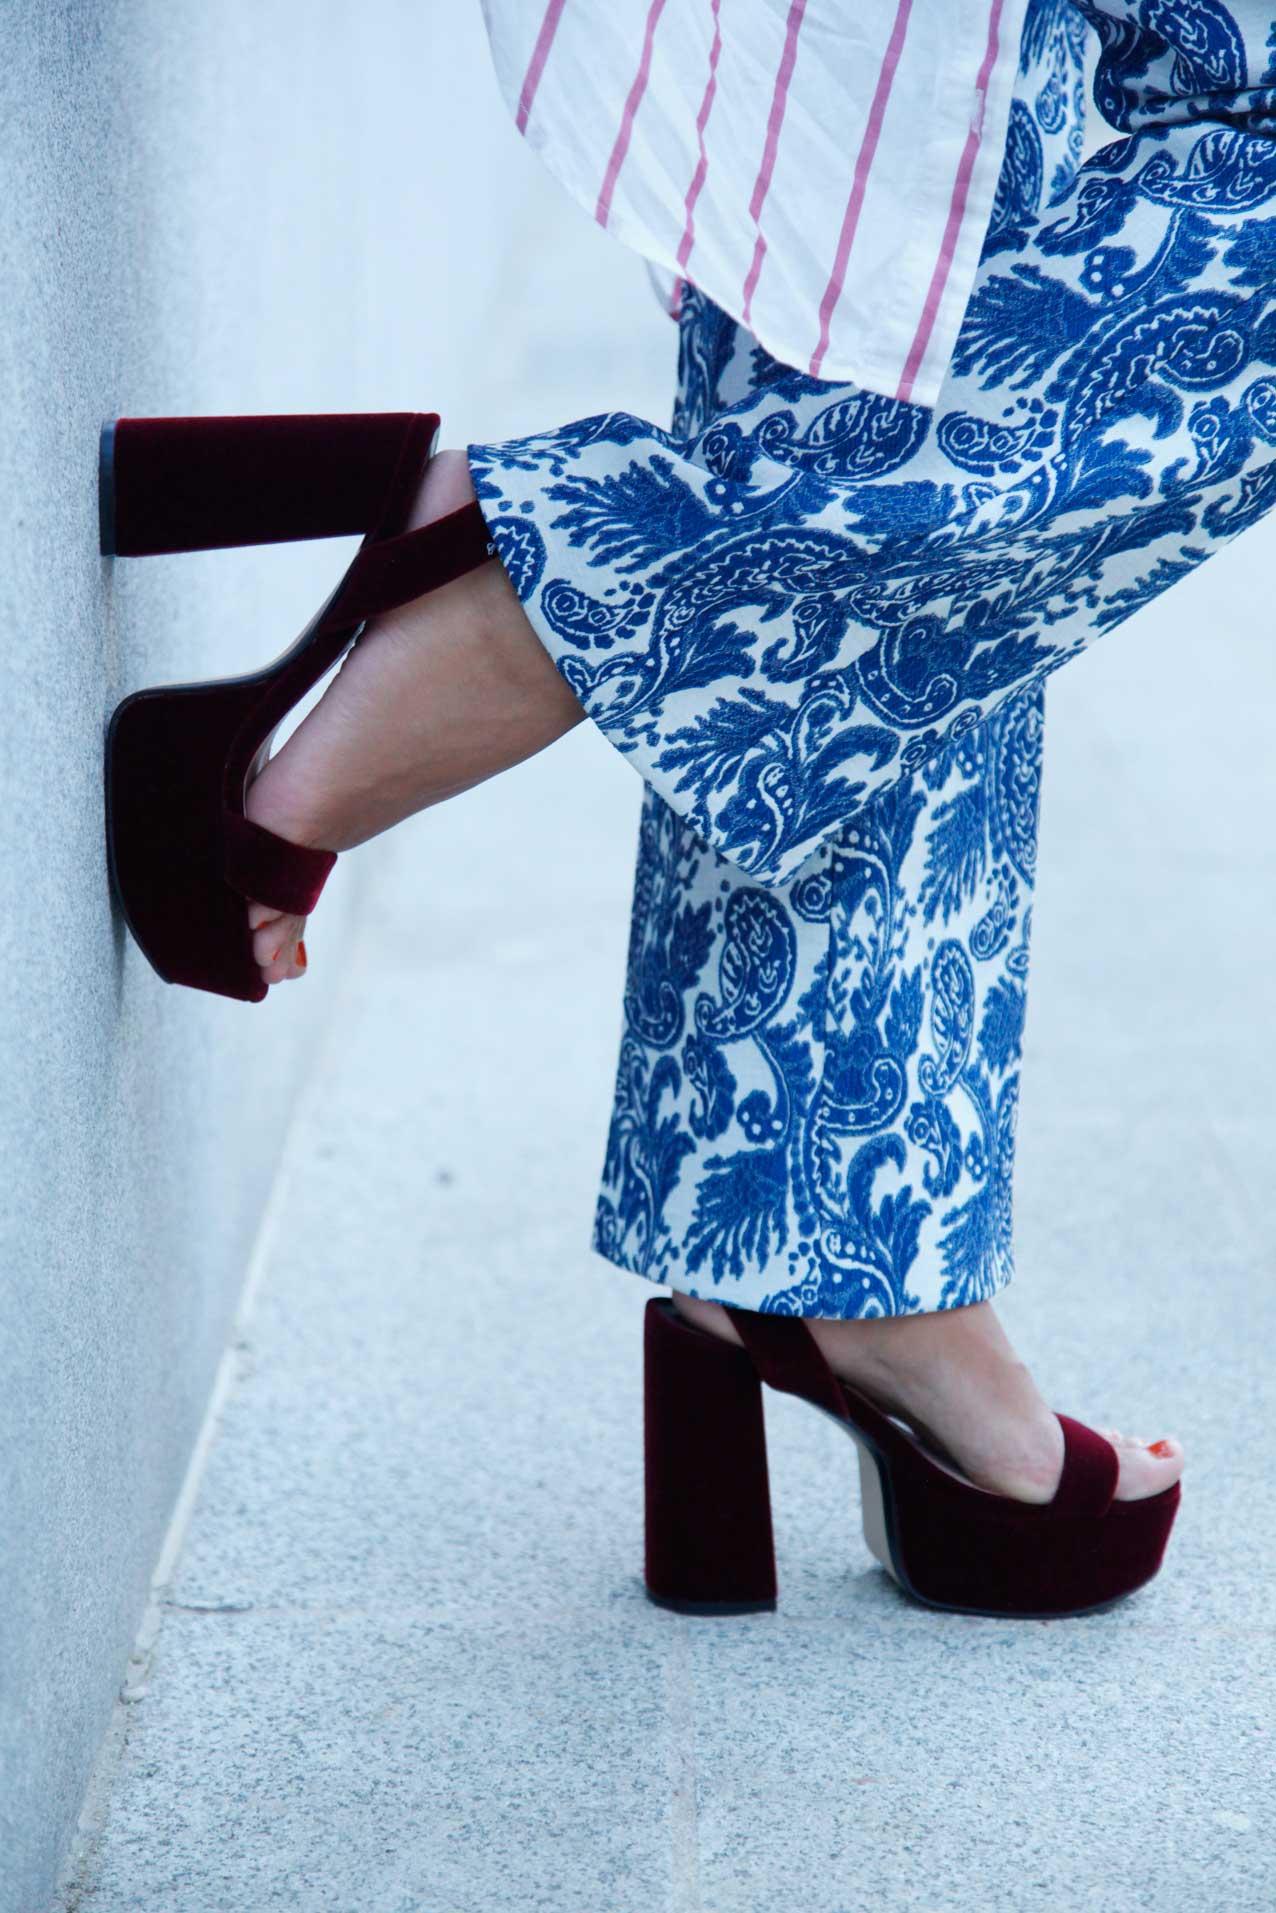 new_shirt-cool_lemonade-tapizado-velvet_platforms-streetstyle9